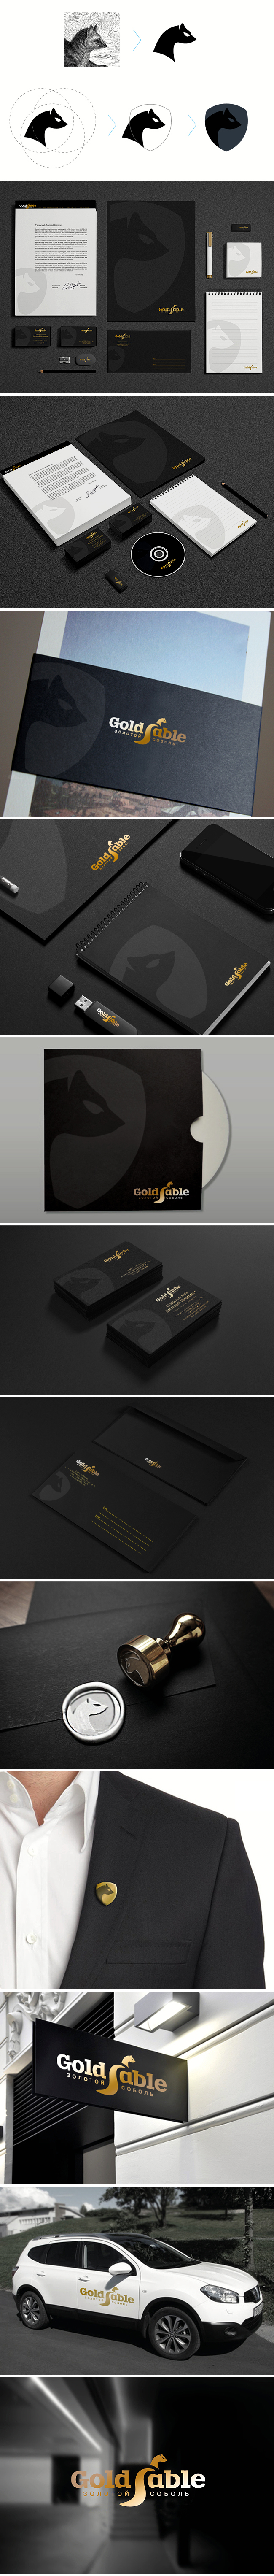 03 Identity GoldSable